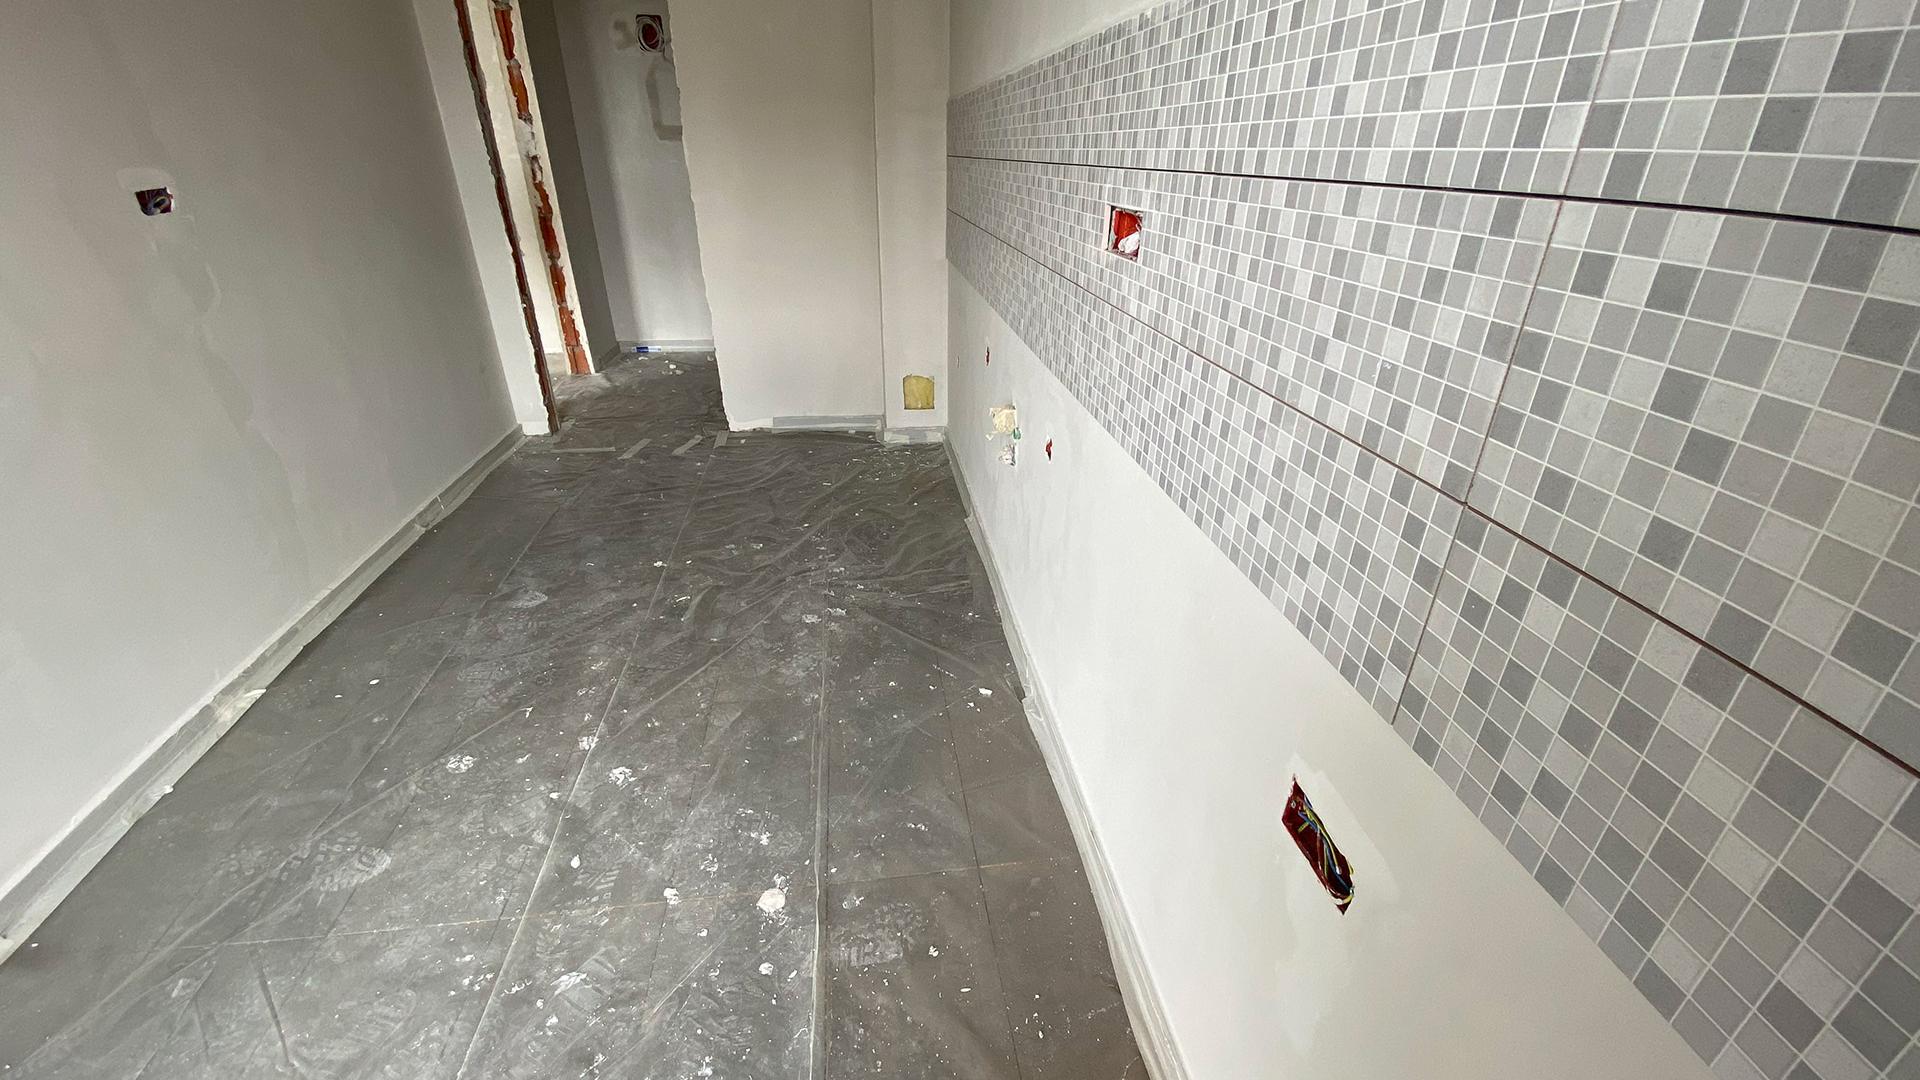 Stadiu executie Uverturii Residence 11 Mai 2020 - Apartamente si garsoniere de vanzare Militari, Gorjului - 2